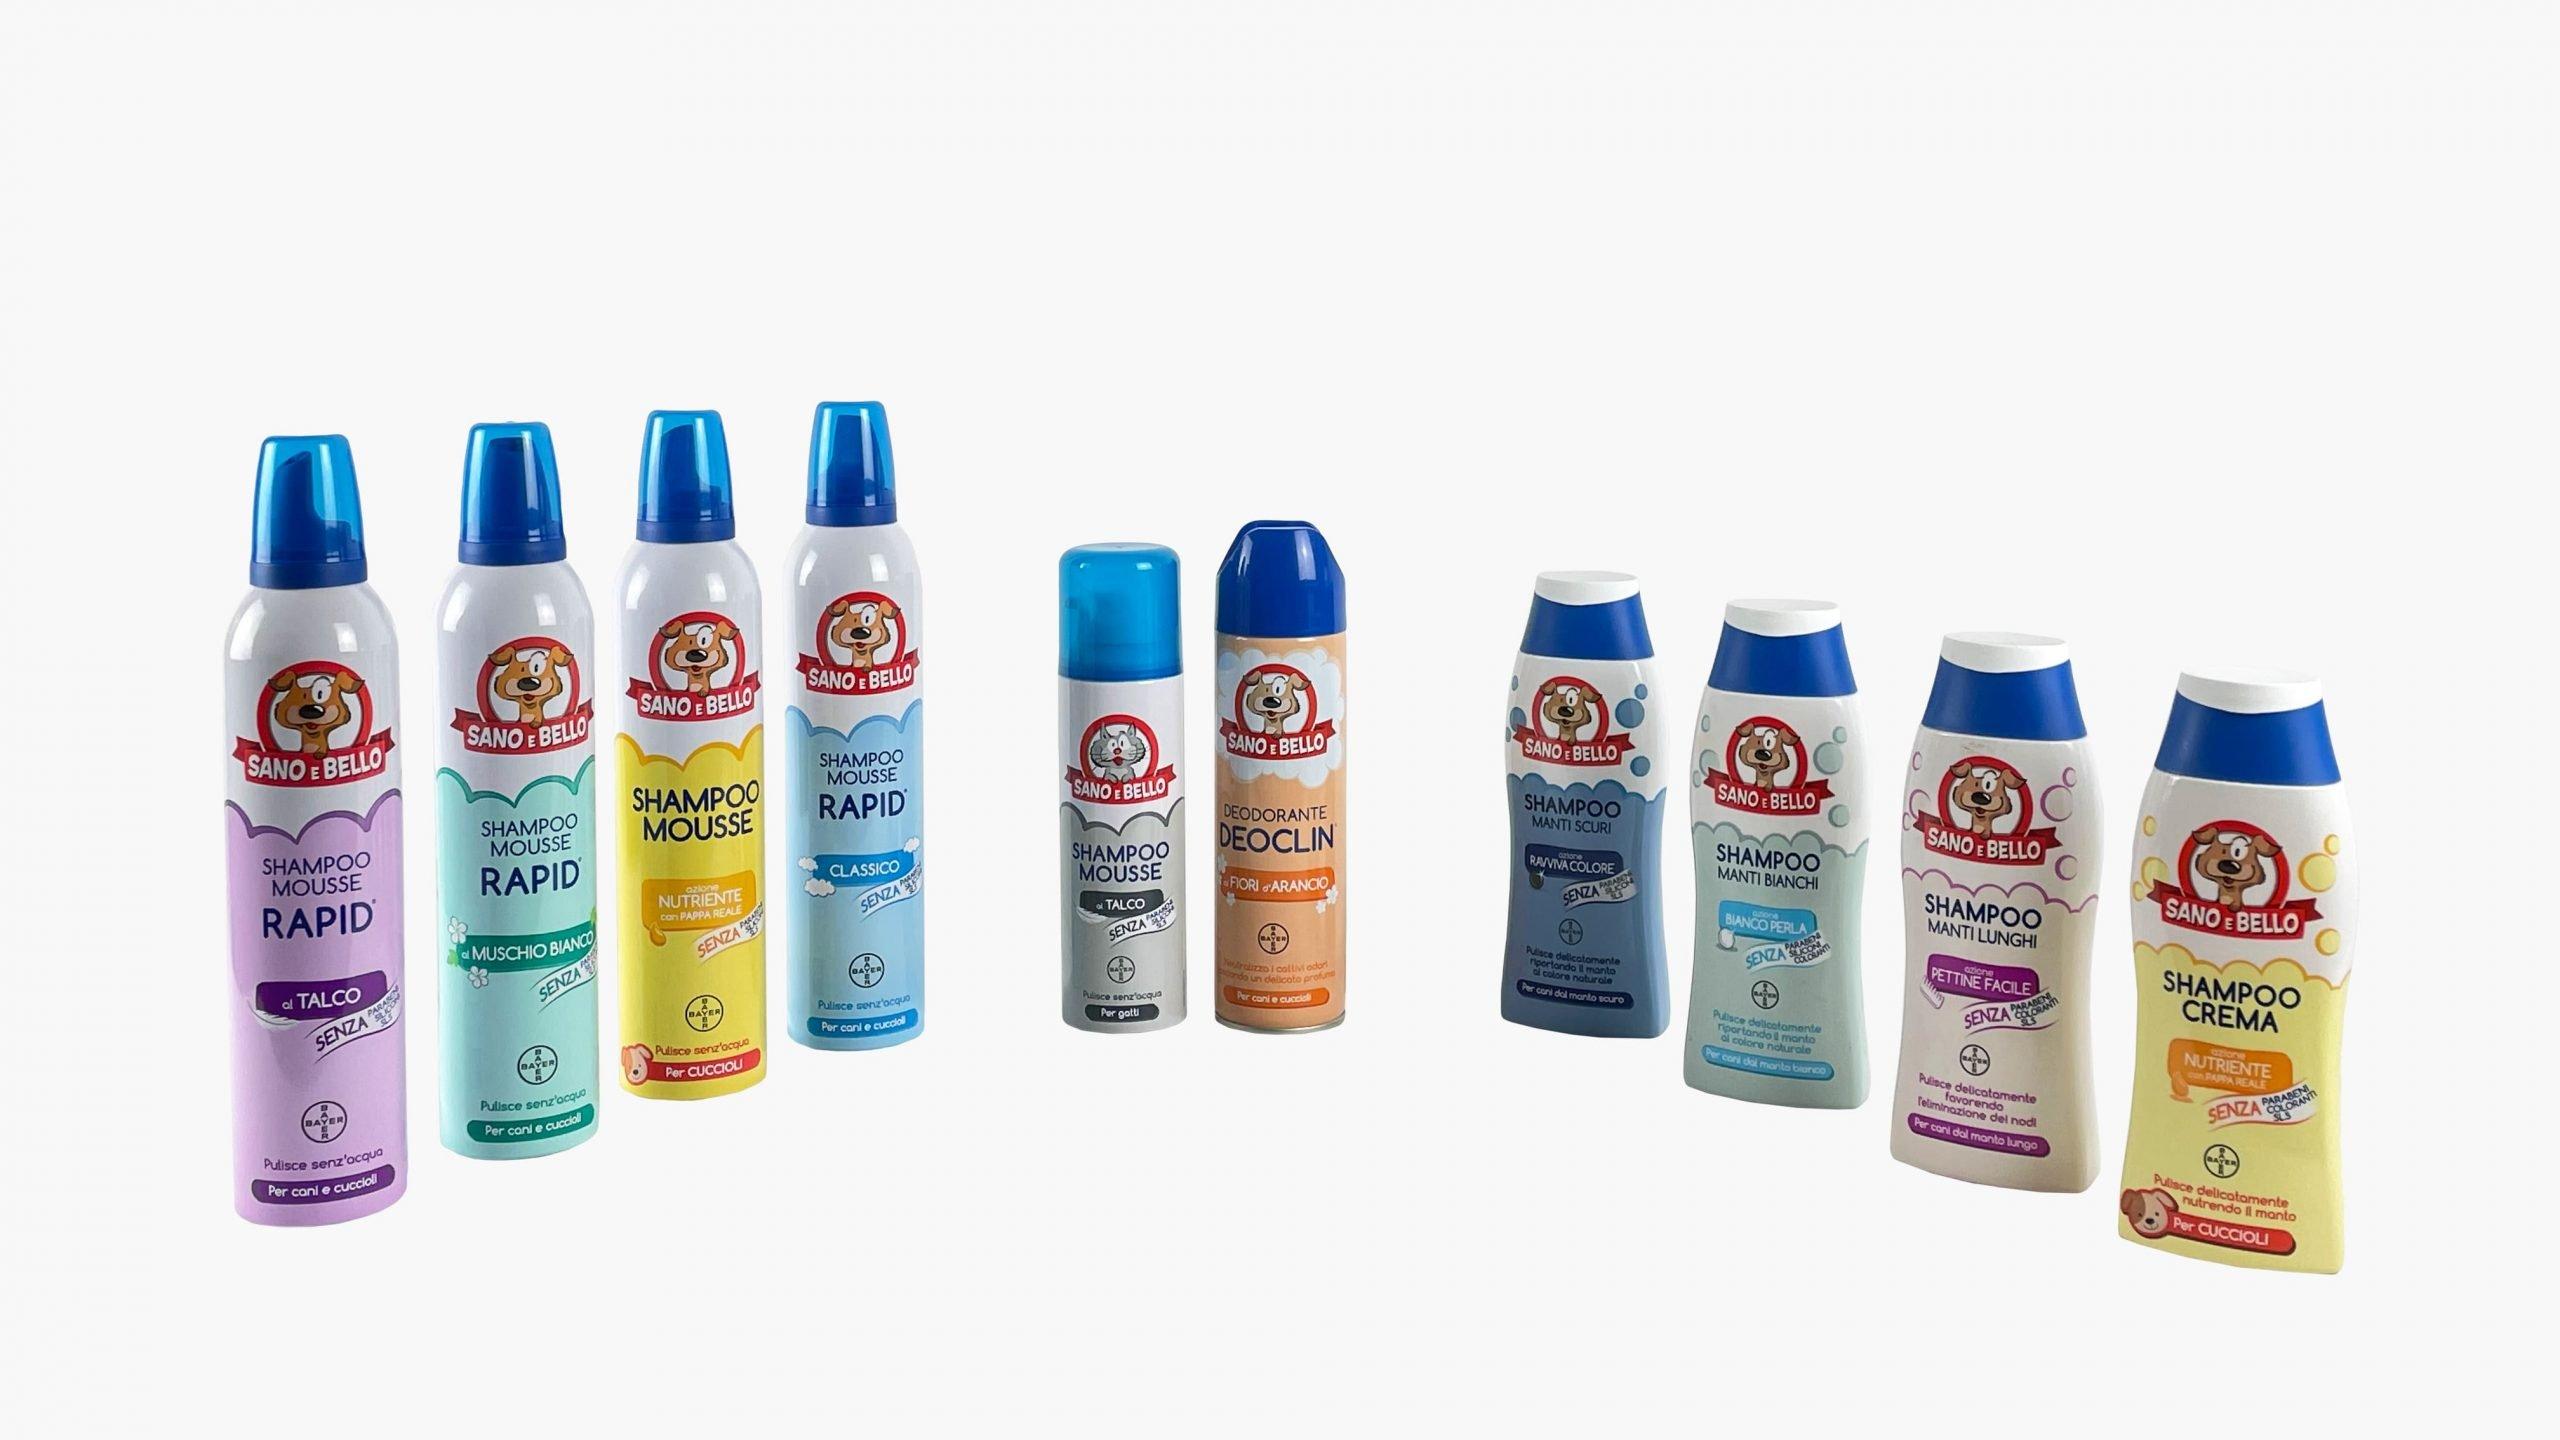 petpoint-shampoo-sano e bello